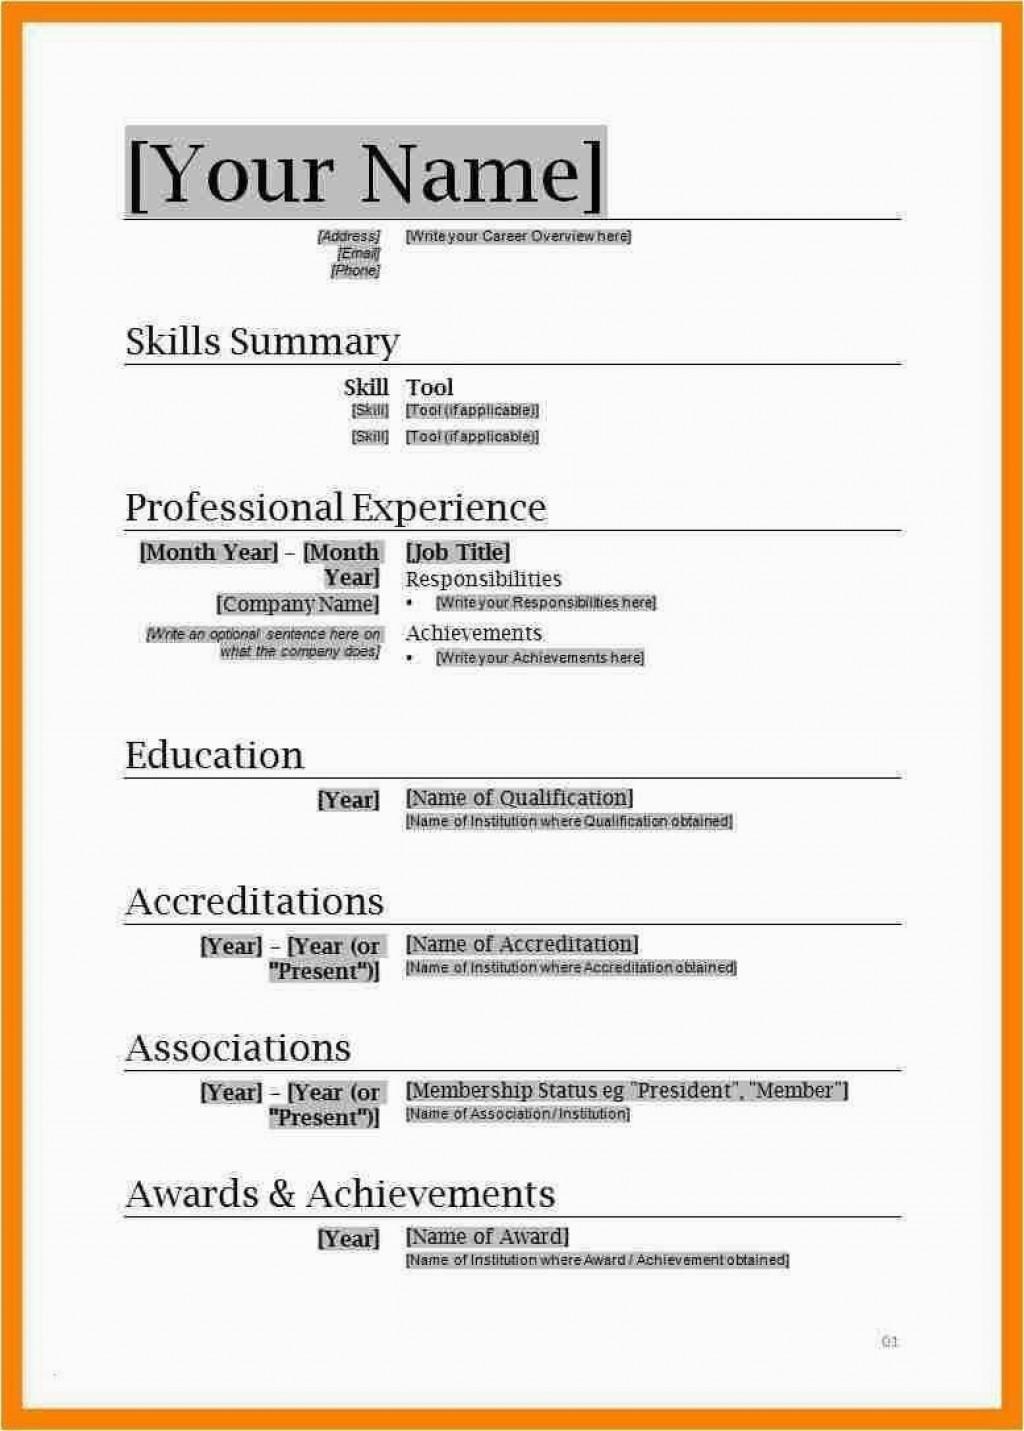 001 Fascinating Free Professional Resume Template Microsoft Word Sample  Cv 2010Large